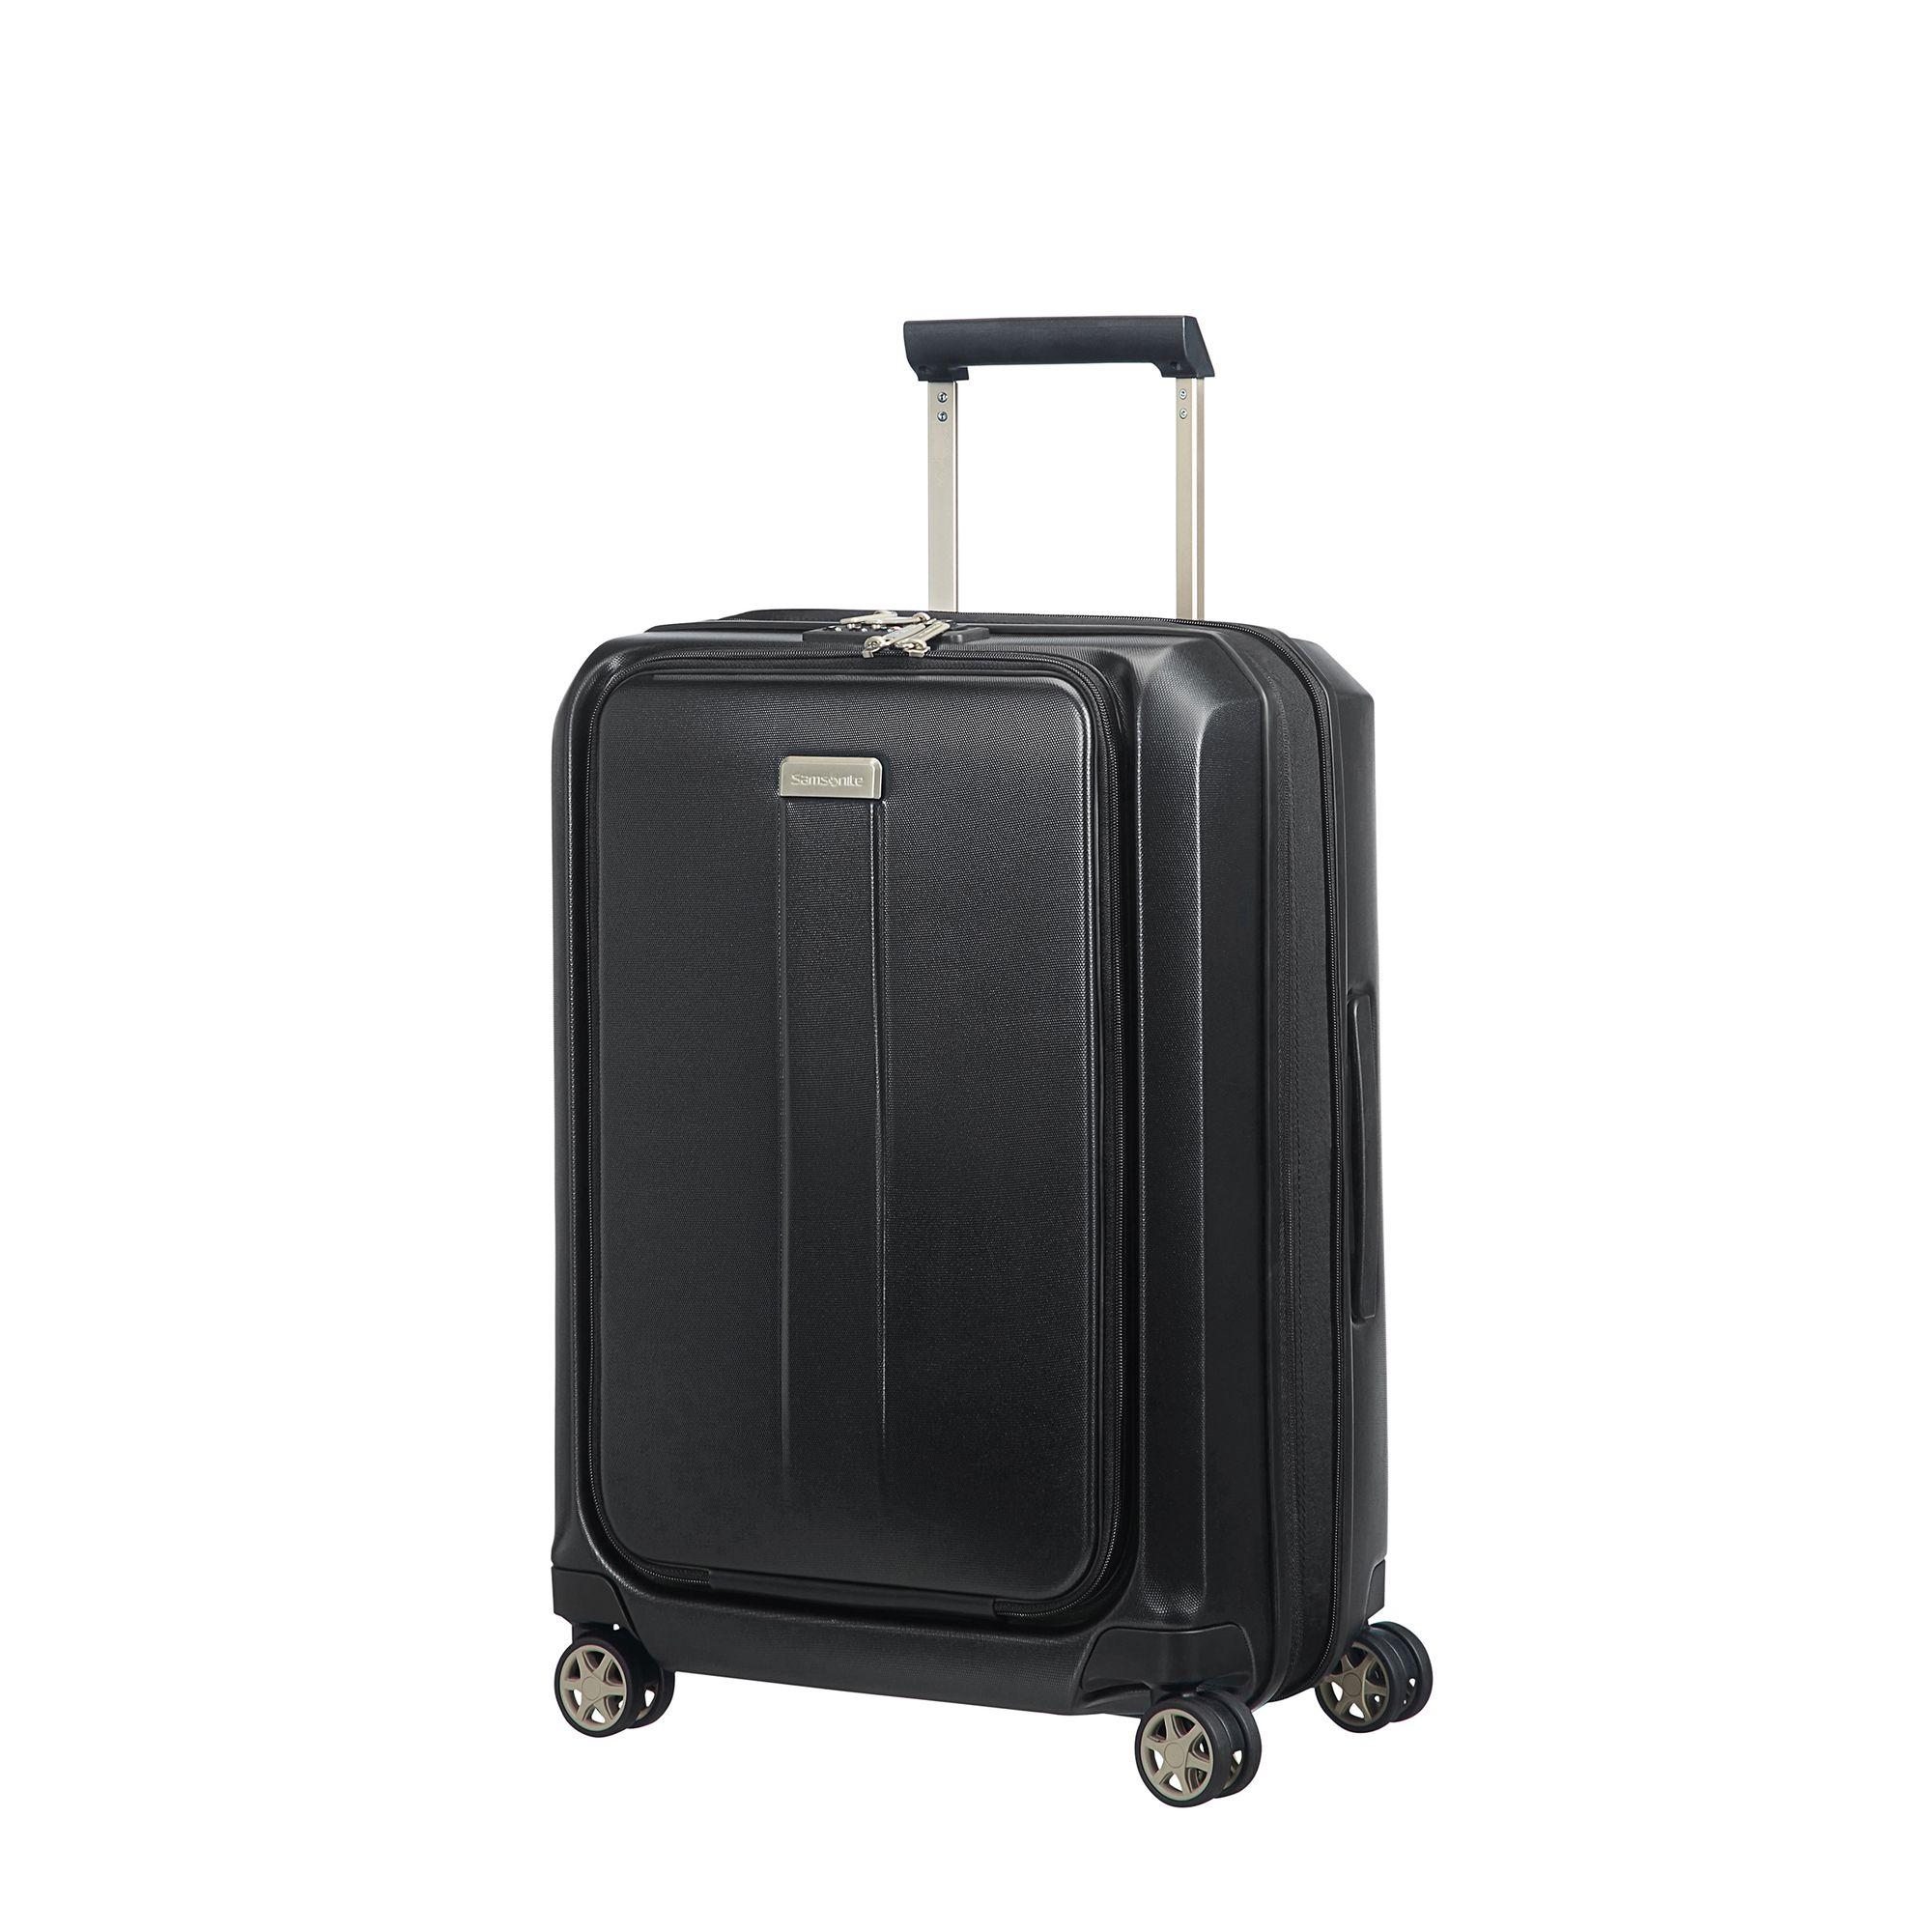 Samsonite Prodigy resväska med 4 hjul, 55 cm, Svart